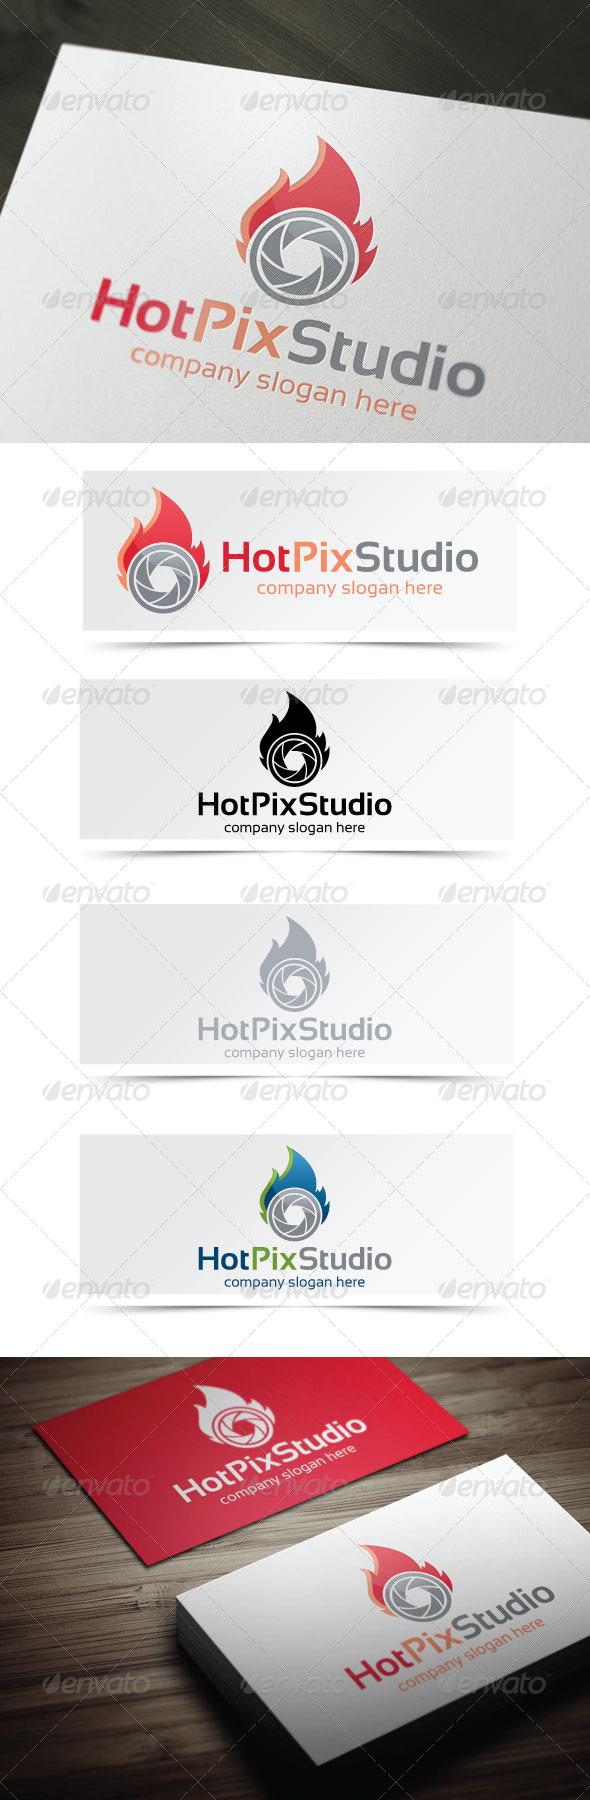 GraphicRiver Hot Pix Studio 4570305